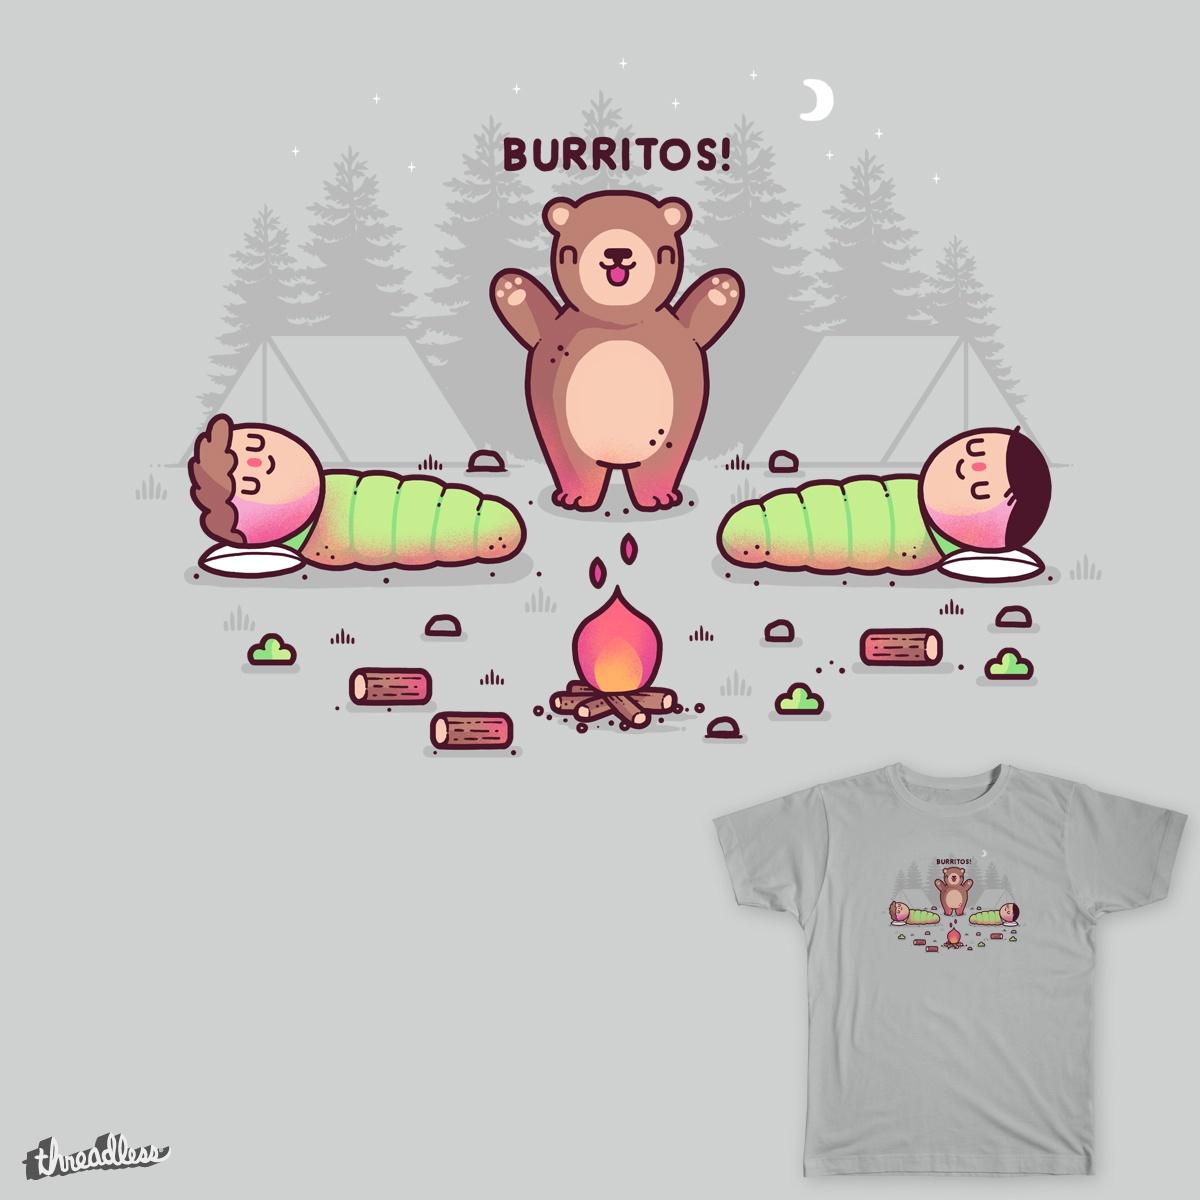 Burritos  by randyotter3000 on Threadless